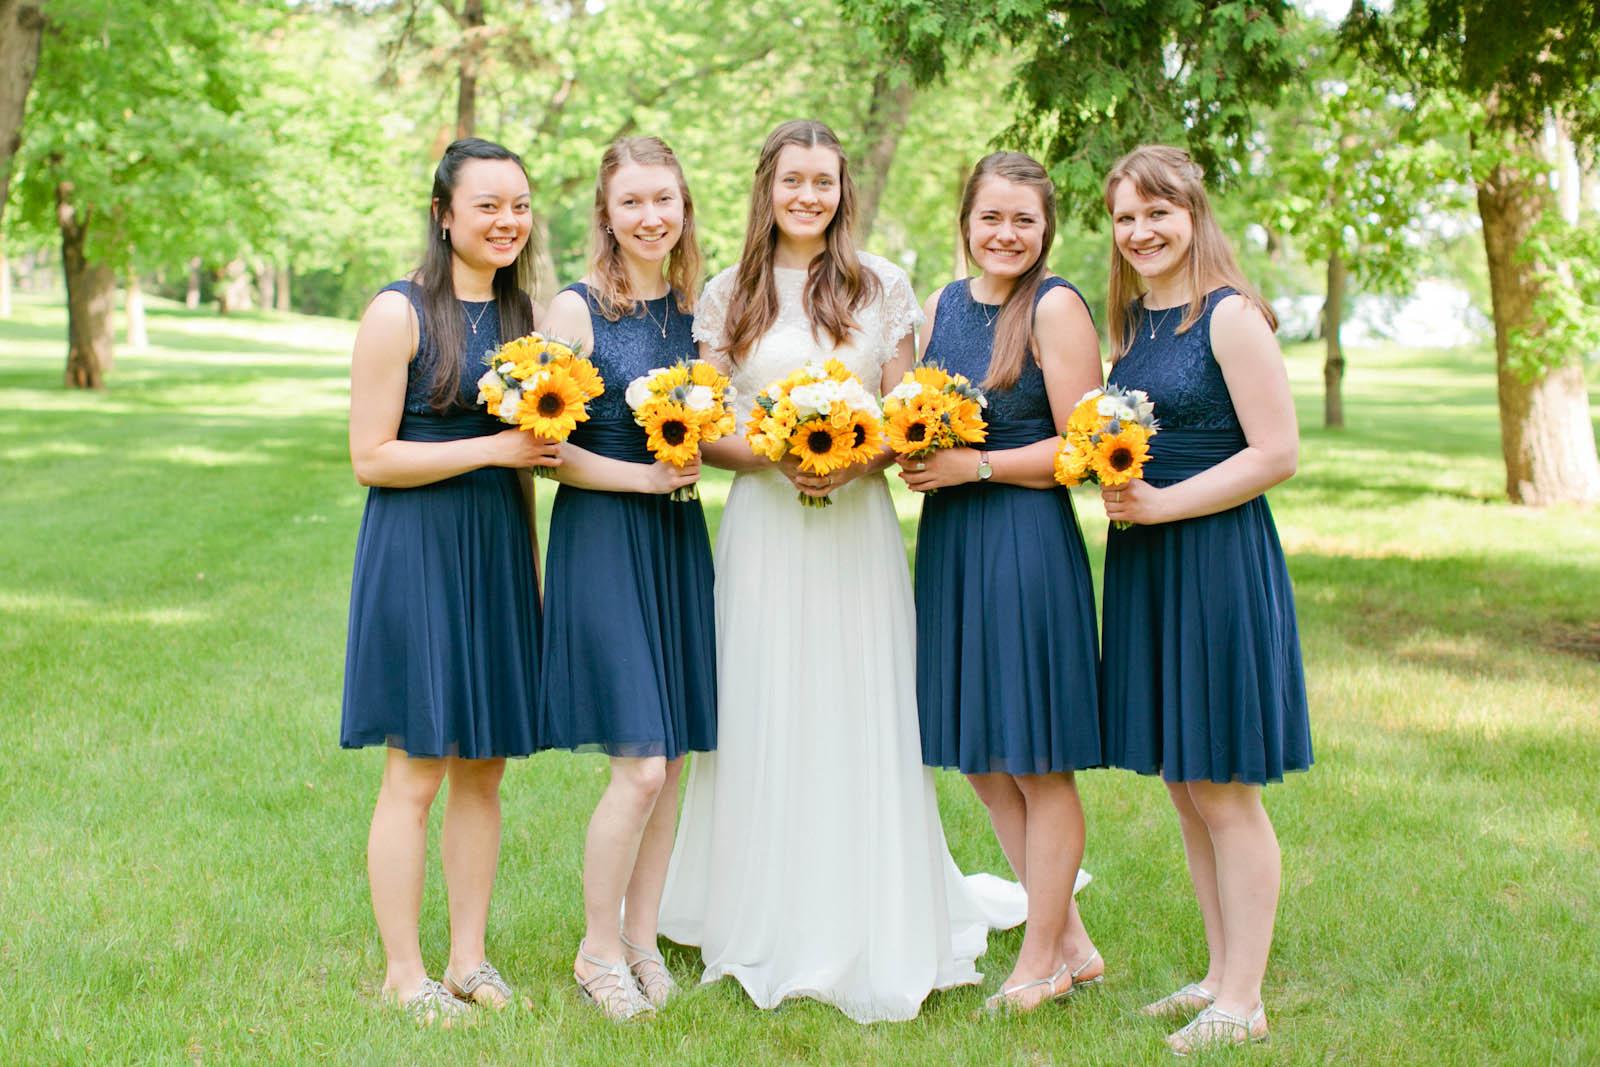 bride and bridesmaids outdoor minnesota wedding photographer